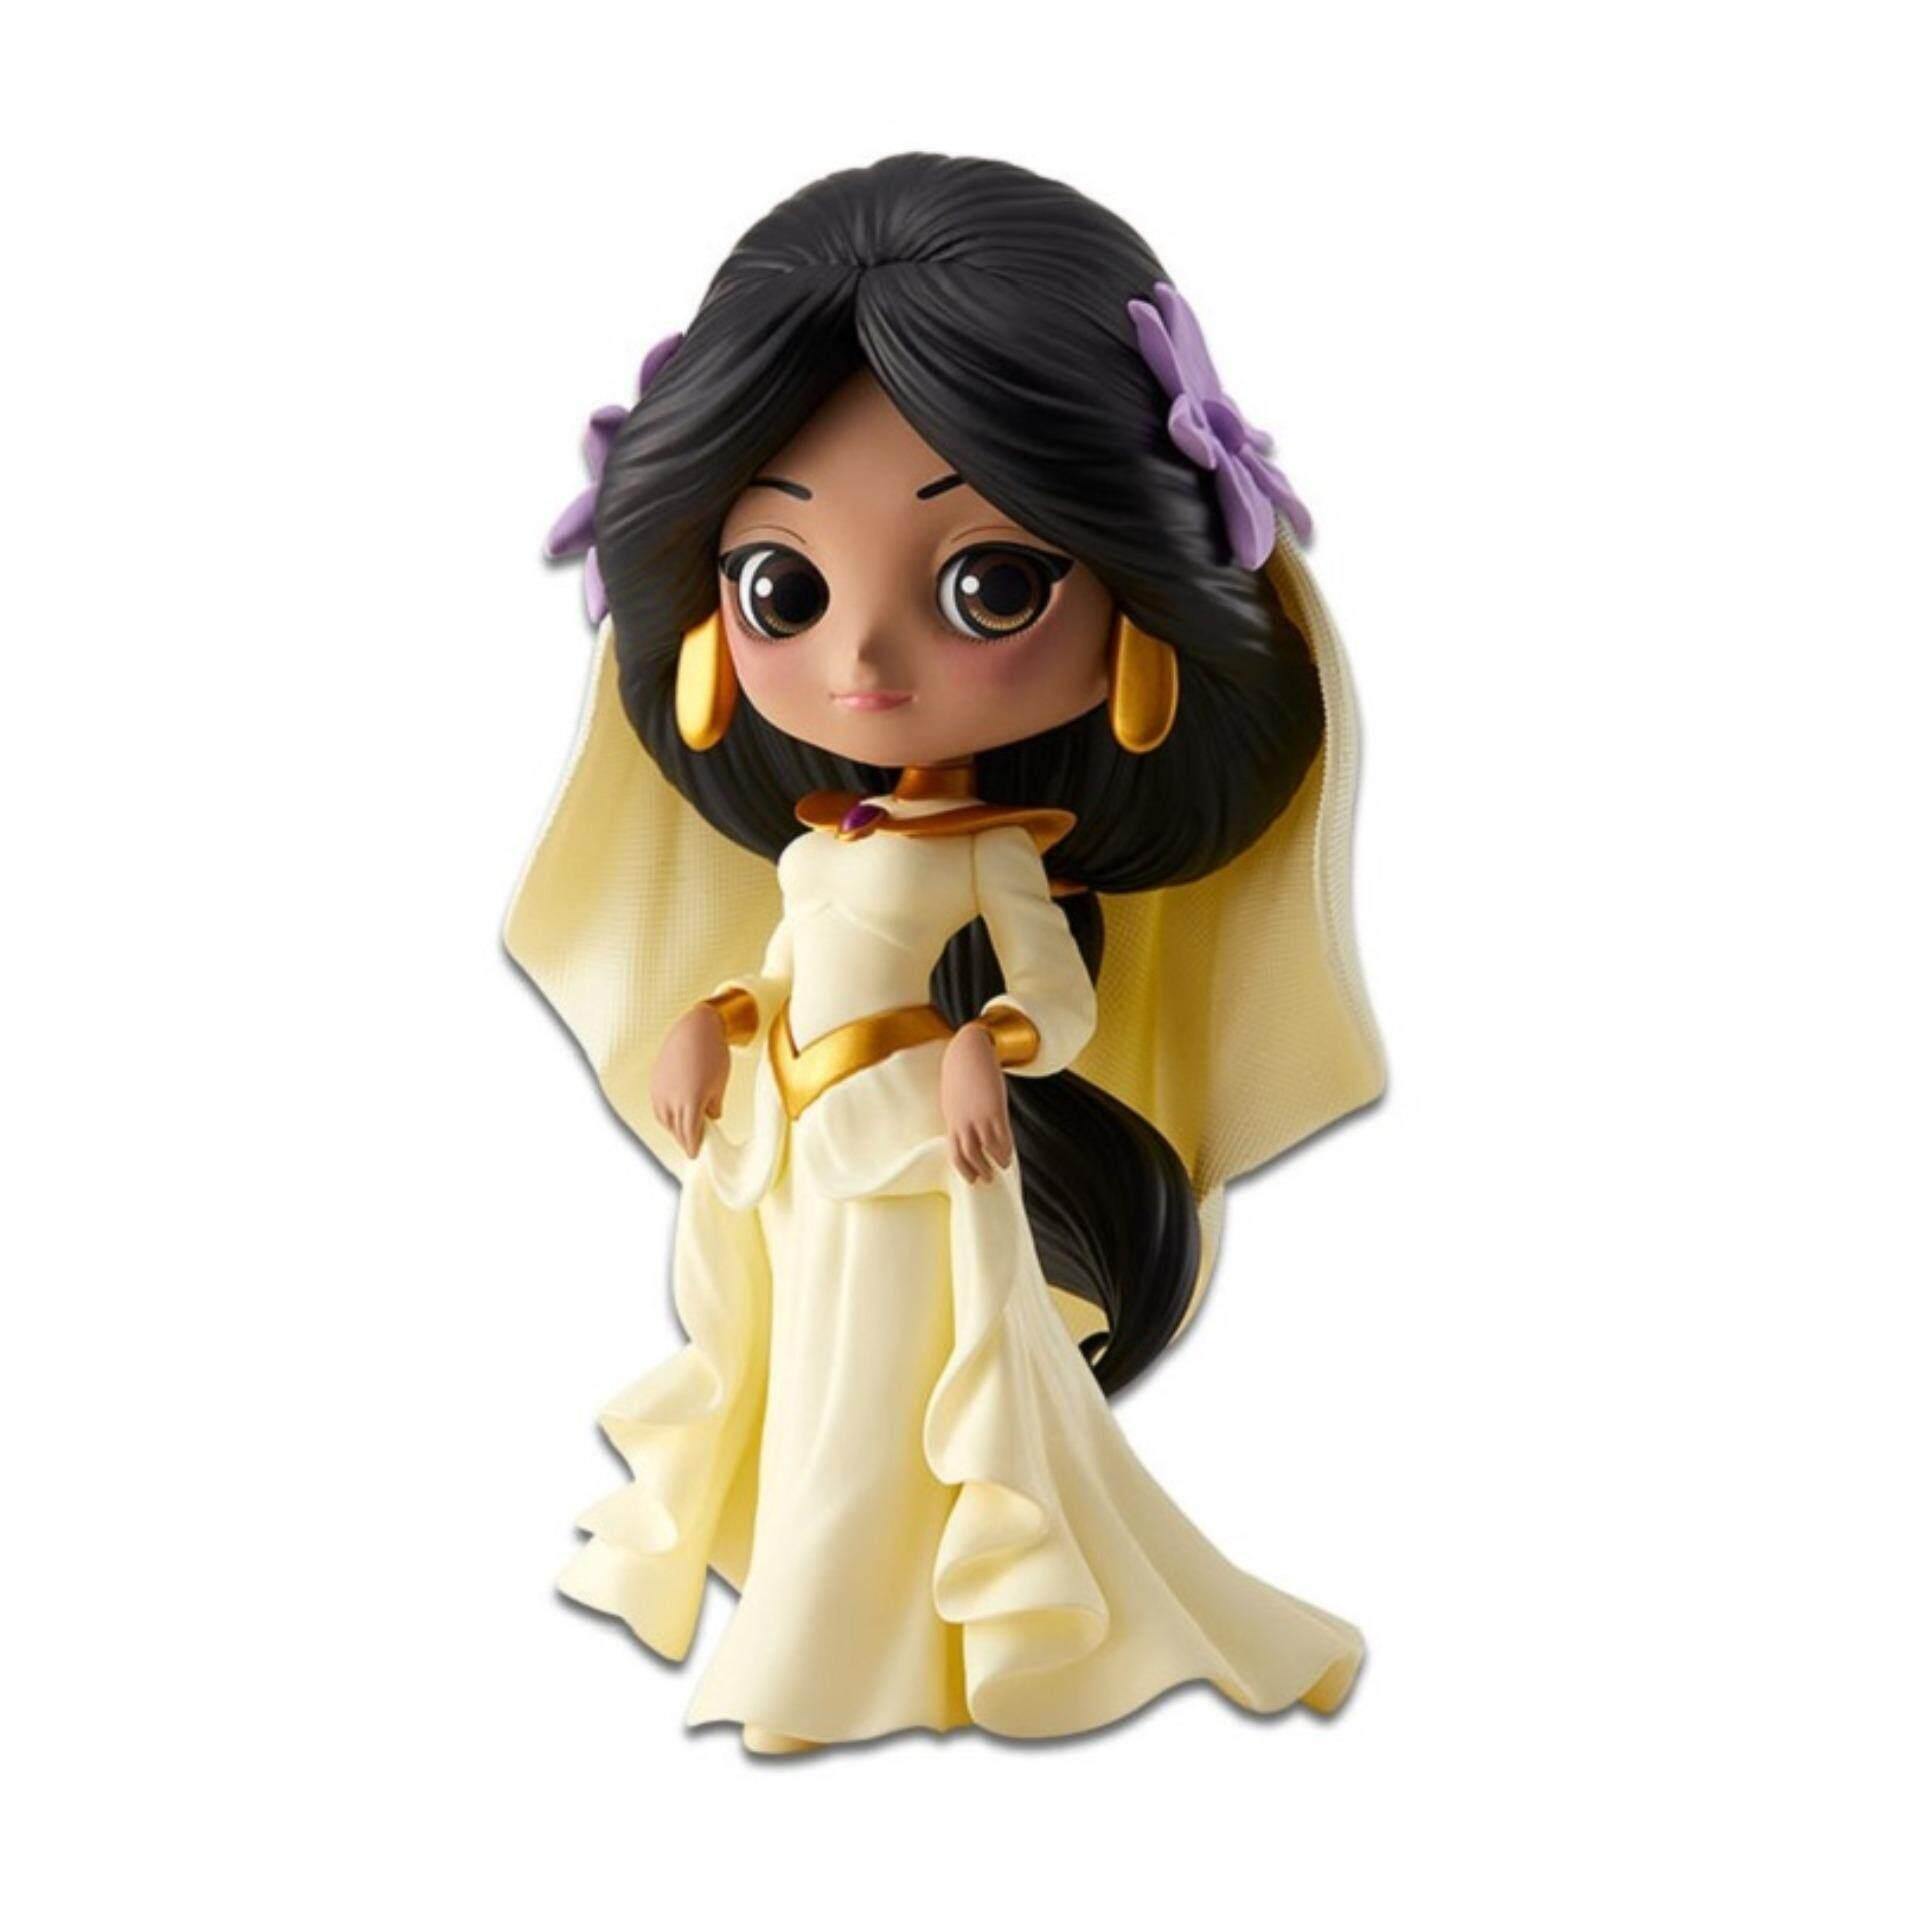 Banpresto Q Posket Disney Princess Figure Pastel Version - Jasmine Dreamy Style Toys for boys